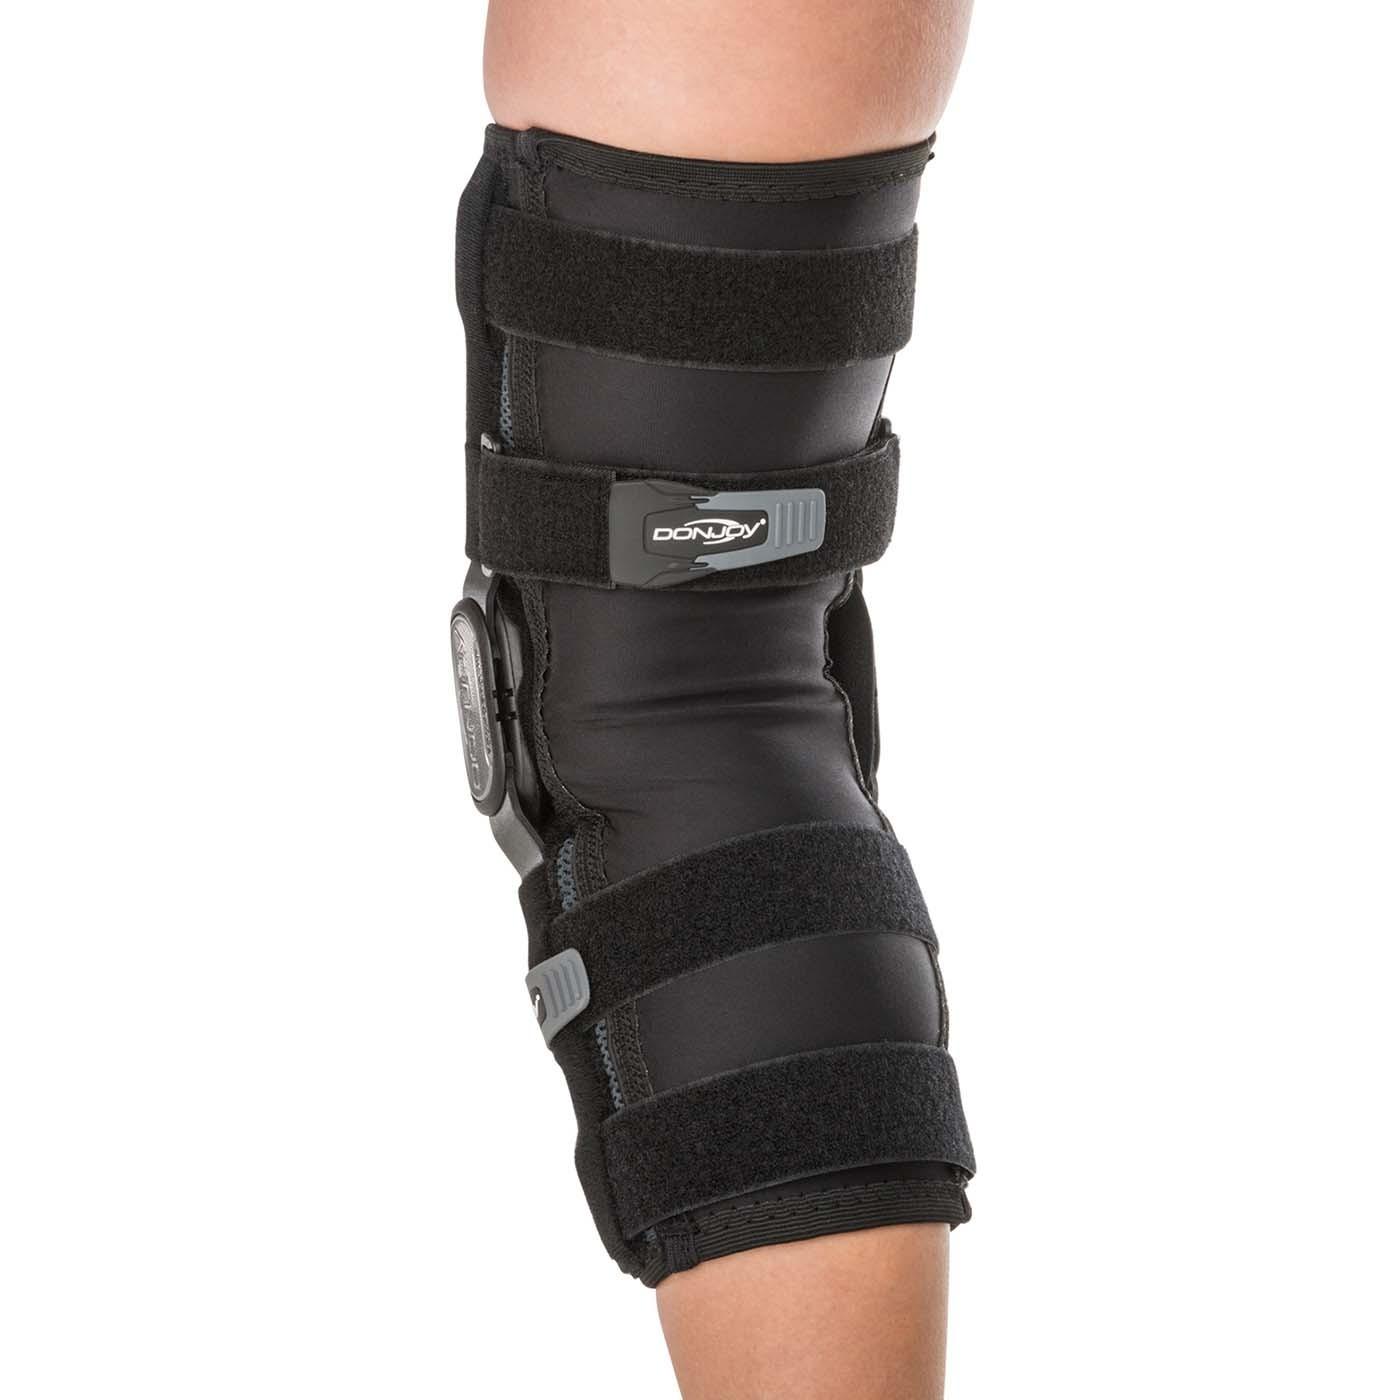 09b7e47a34 Donjoy Fourcepoint Knee Brace Instructions